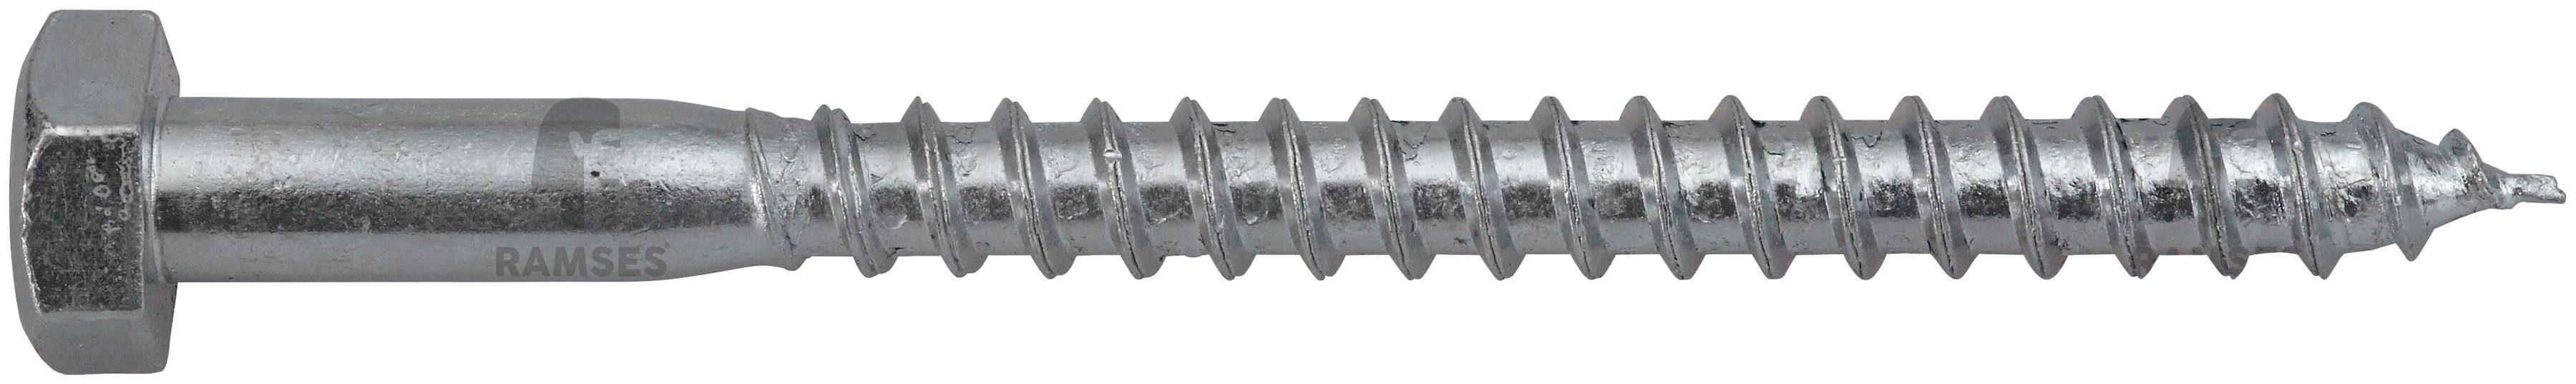 RAMSES Schrauben , Sechskant-Holzschraube 12 x 240 mm 25 Stk.